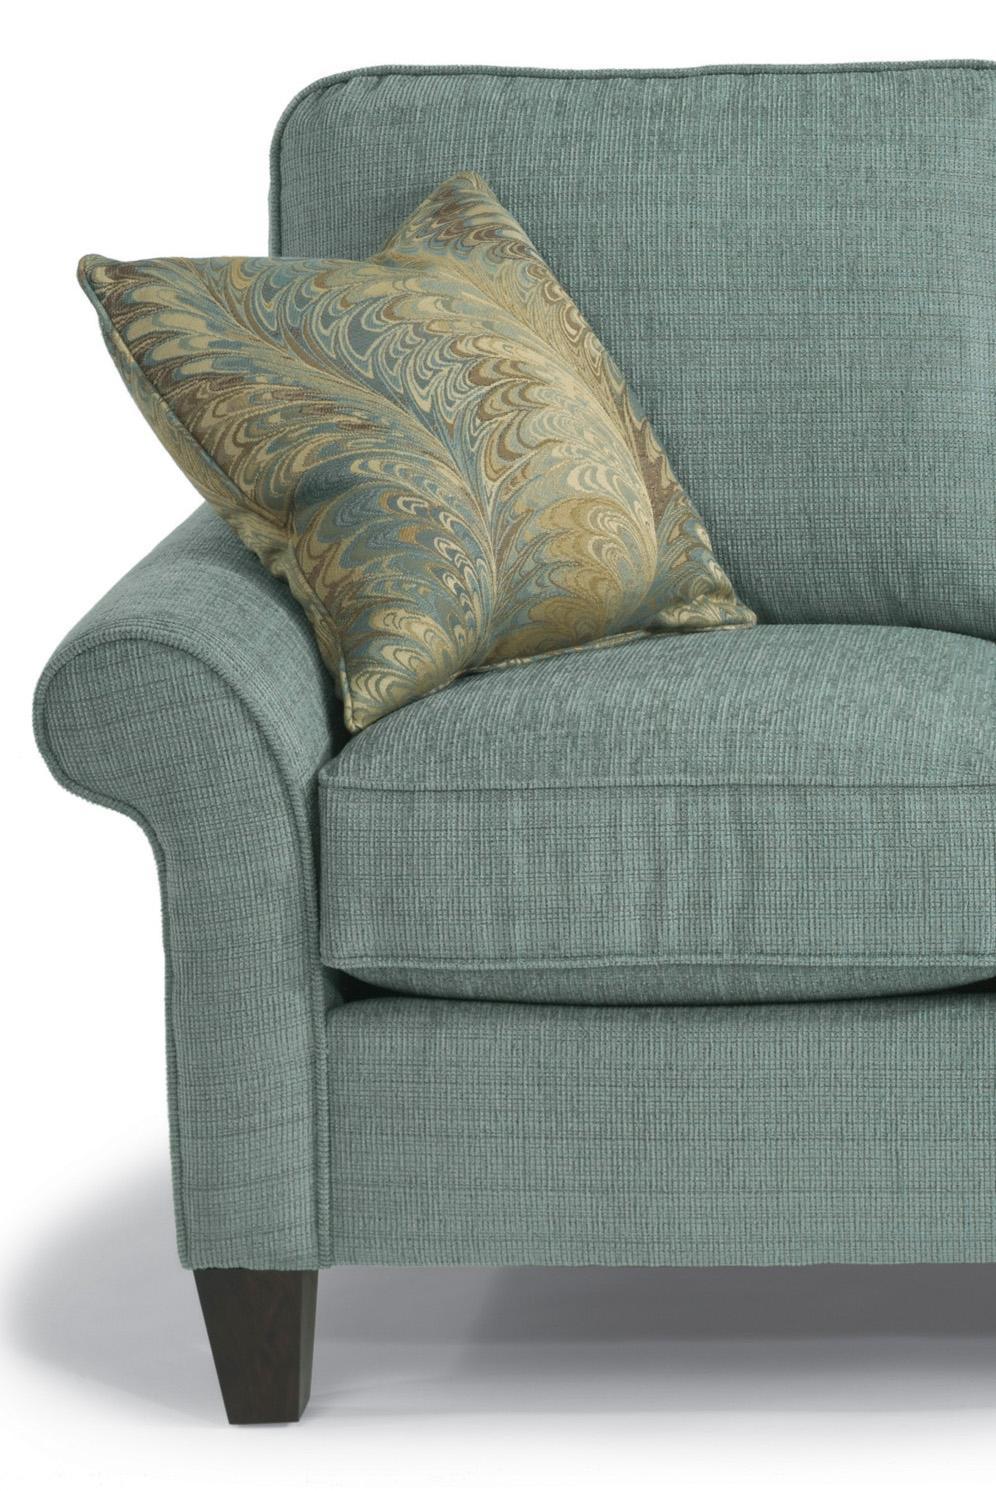 Westside Sof By Flexsteel Belfort Furniture